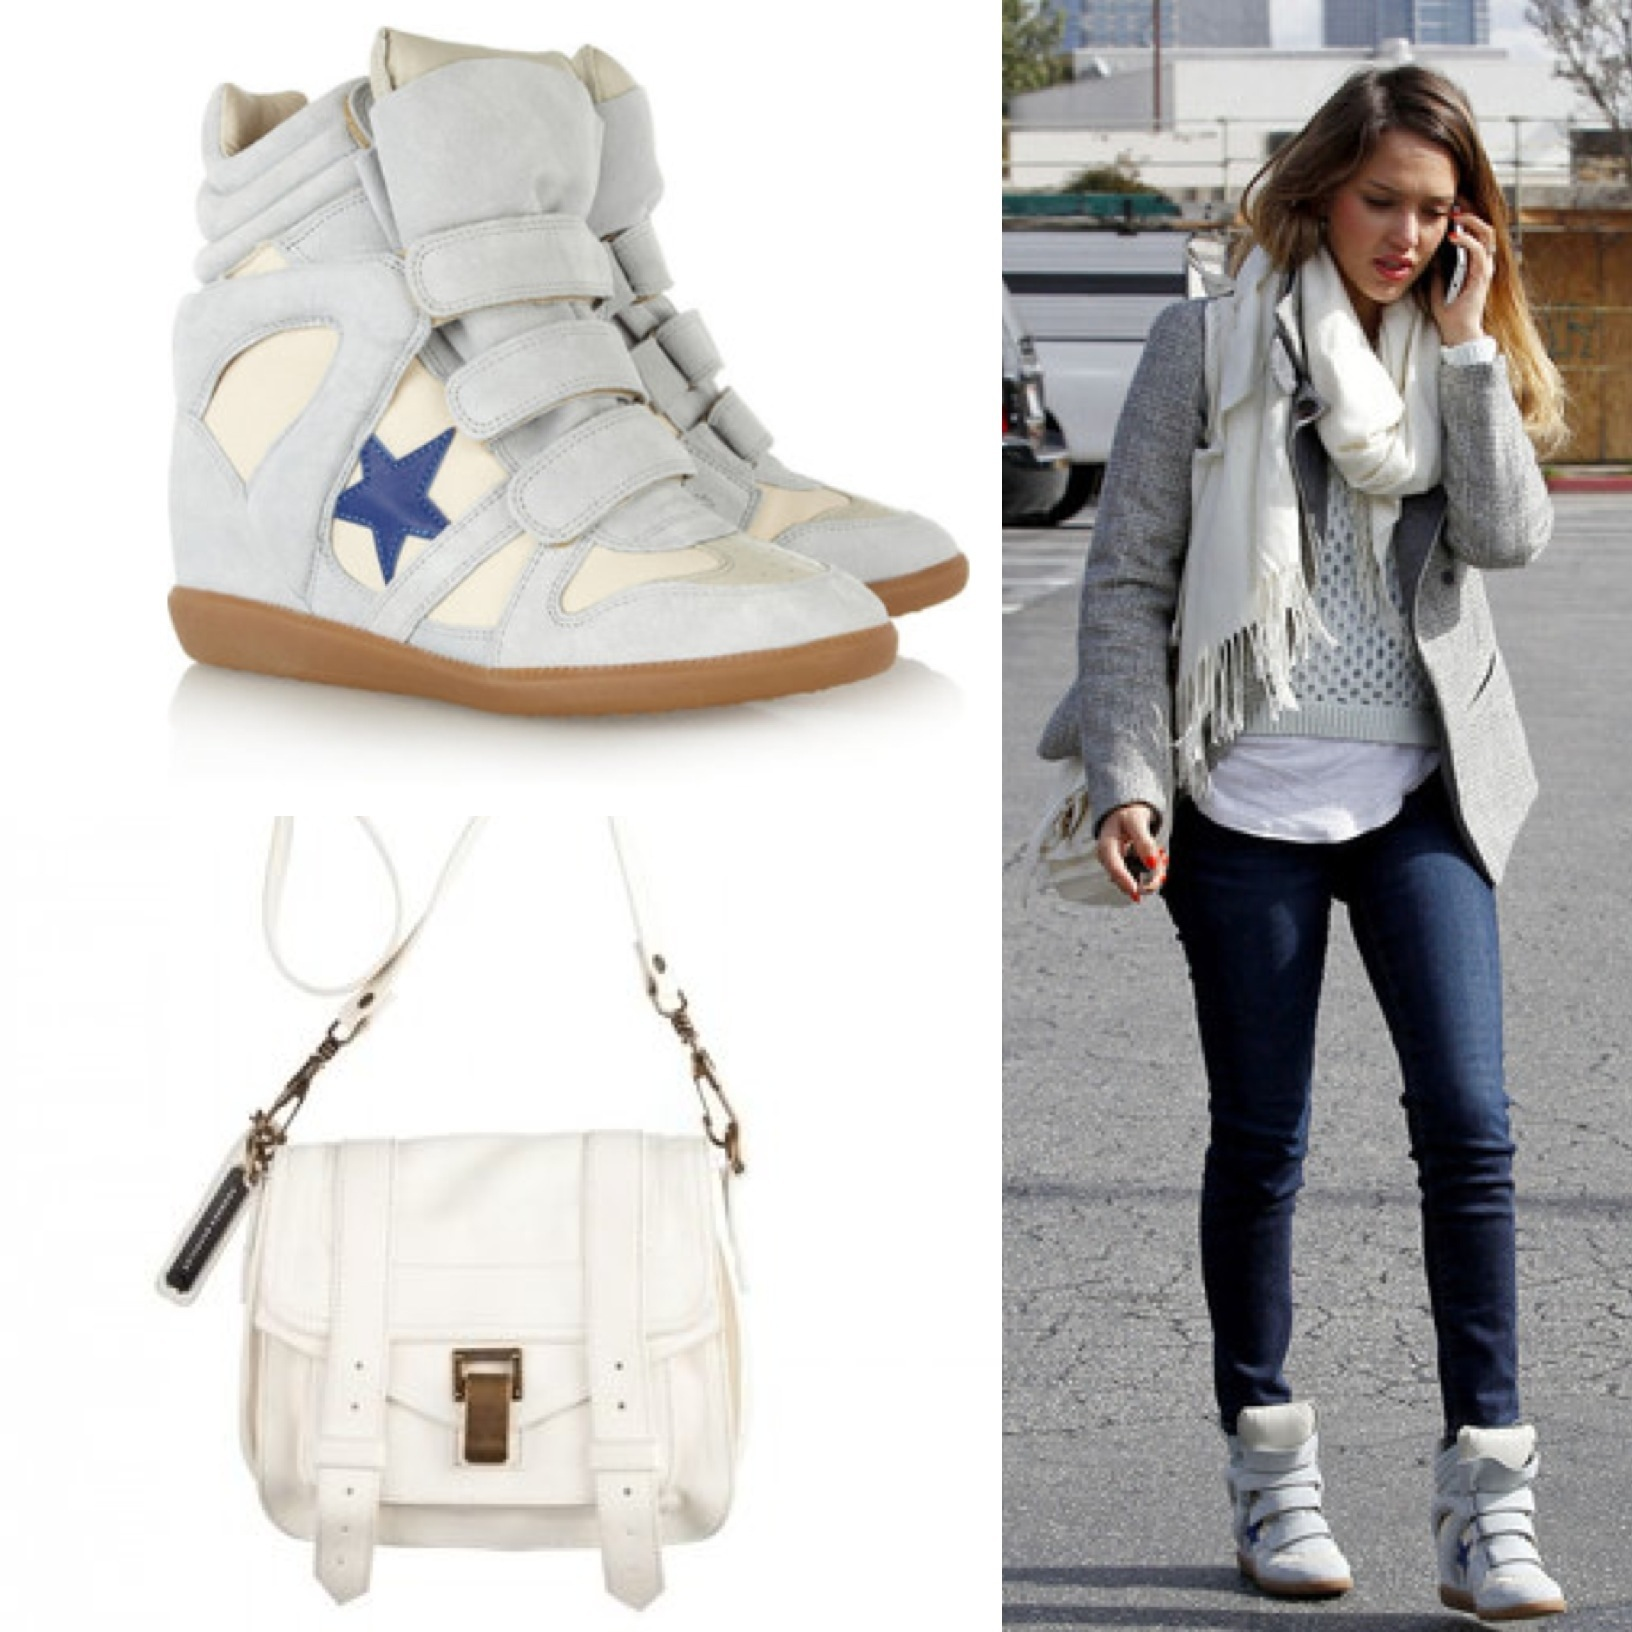 Celebrity bag: jessica alba's proenza schouler